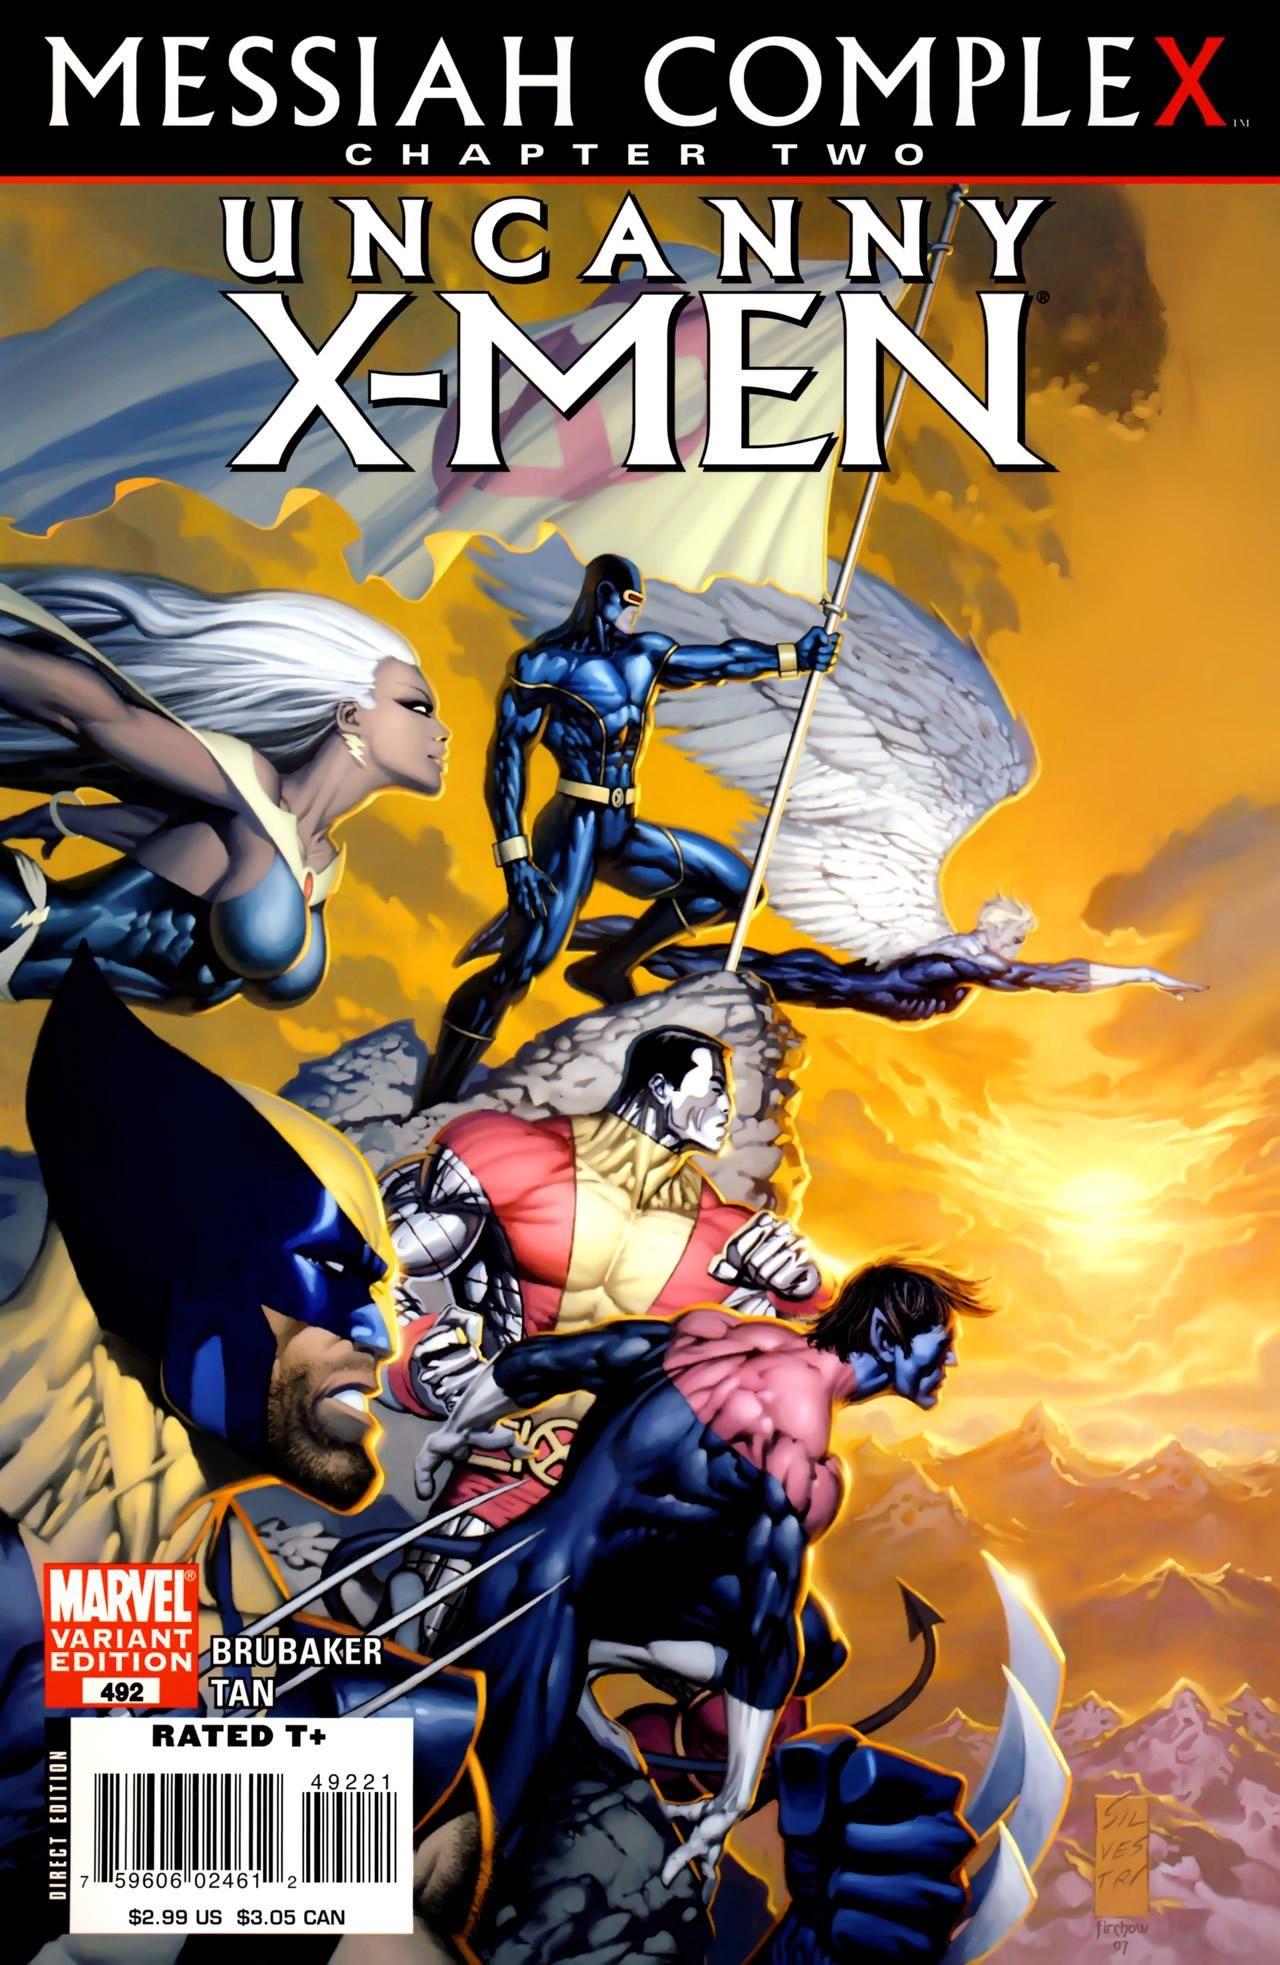 Comiclash Avengers Vs Fantastic Four X Men The Uncanny Golden Age Comics